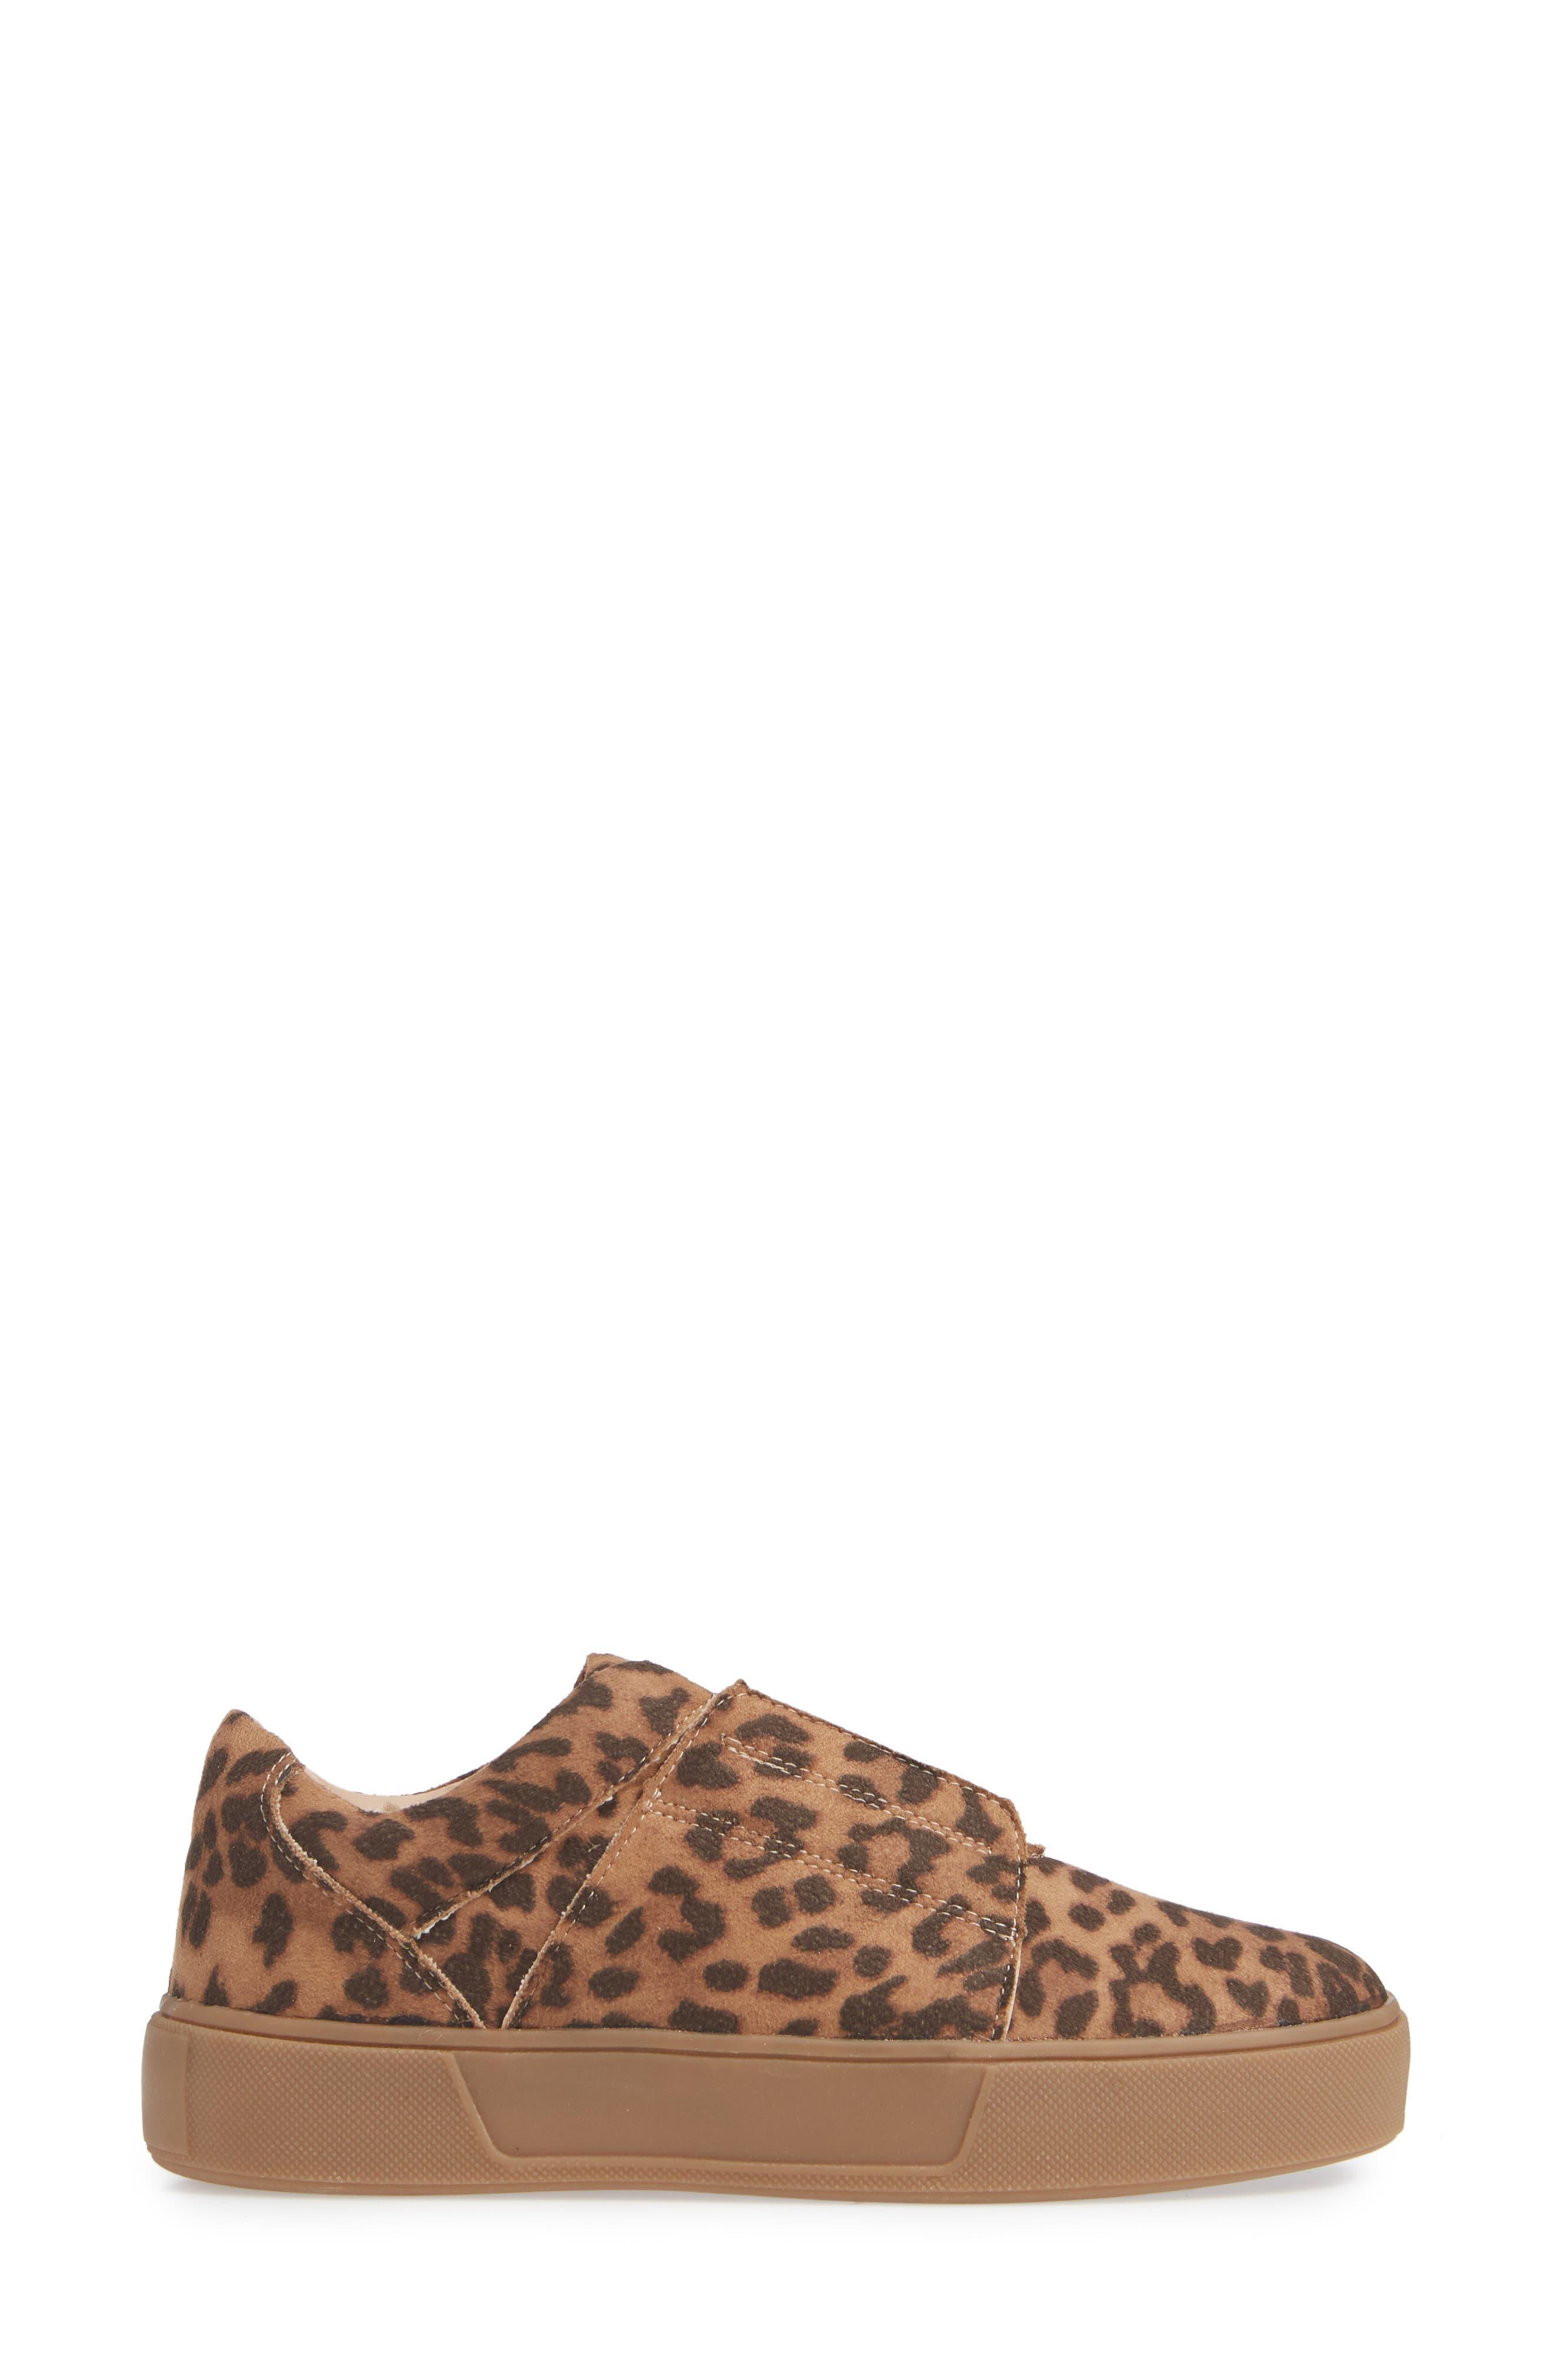 Tamera Slip-On Sneaker,                             Alternate thumbnail 3, color,                             TAN/ LEOPARD MULTI - FABRIC